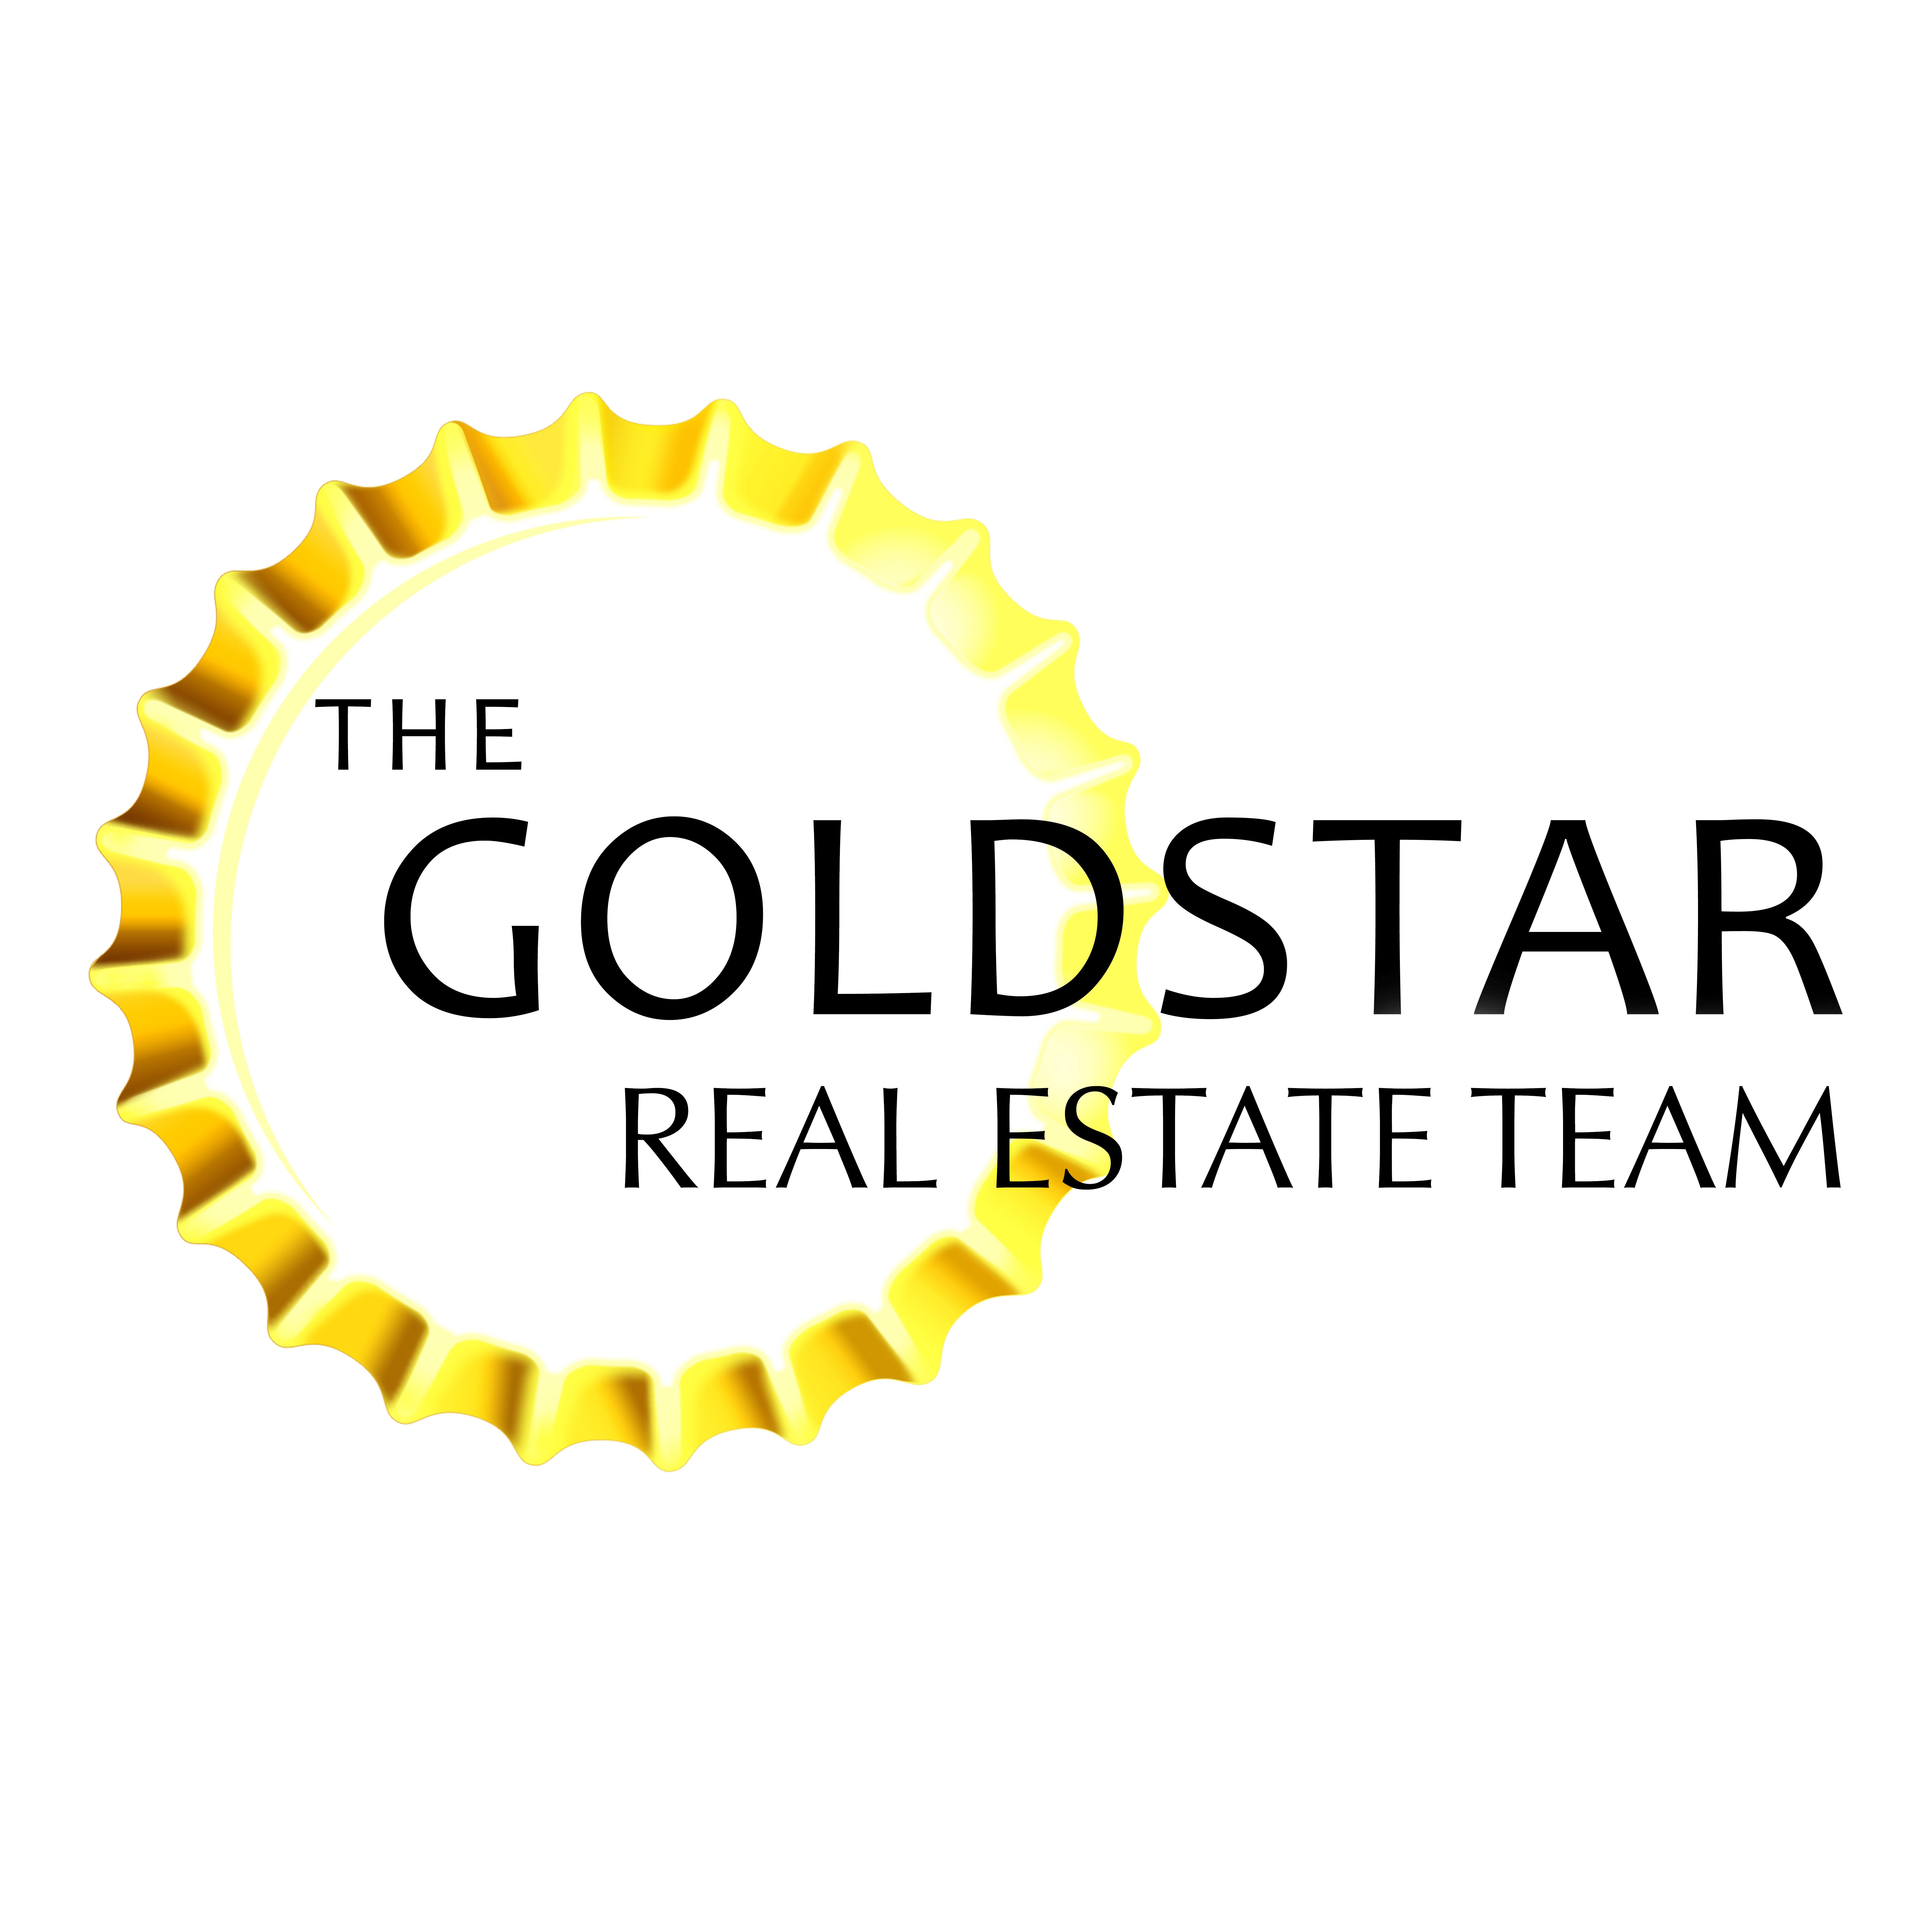 GoldStar Real Estate Team